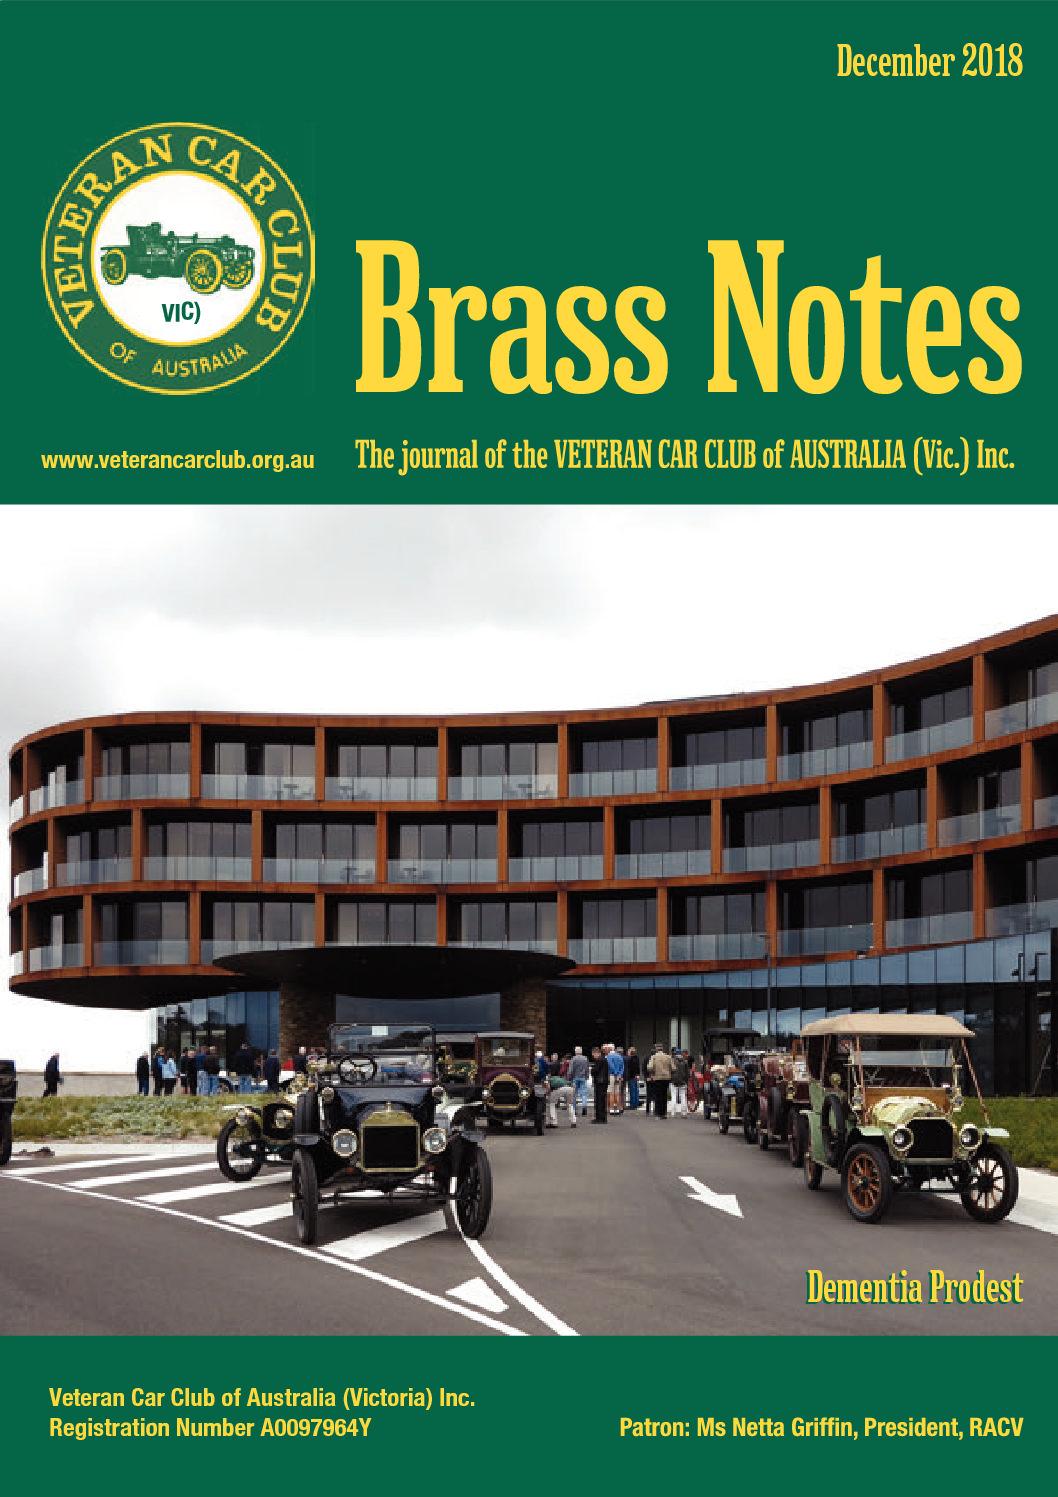 Brass Notes December 2018